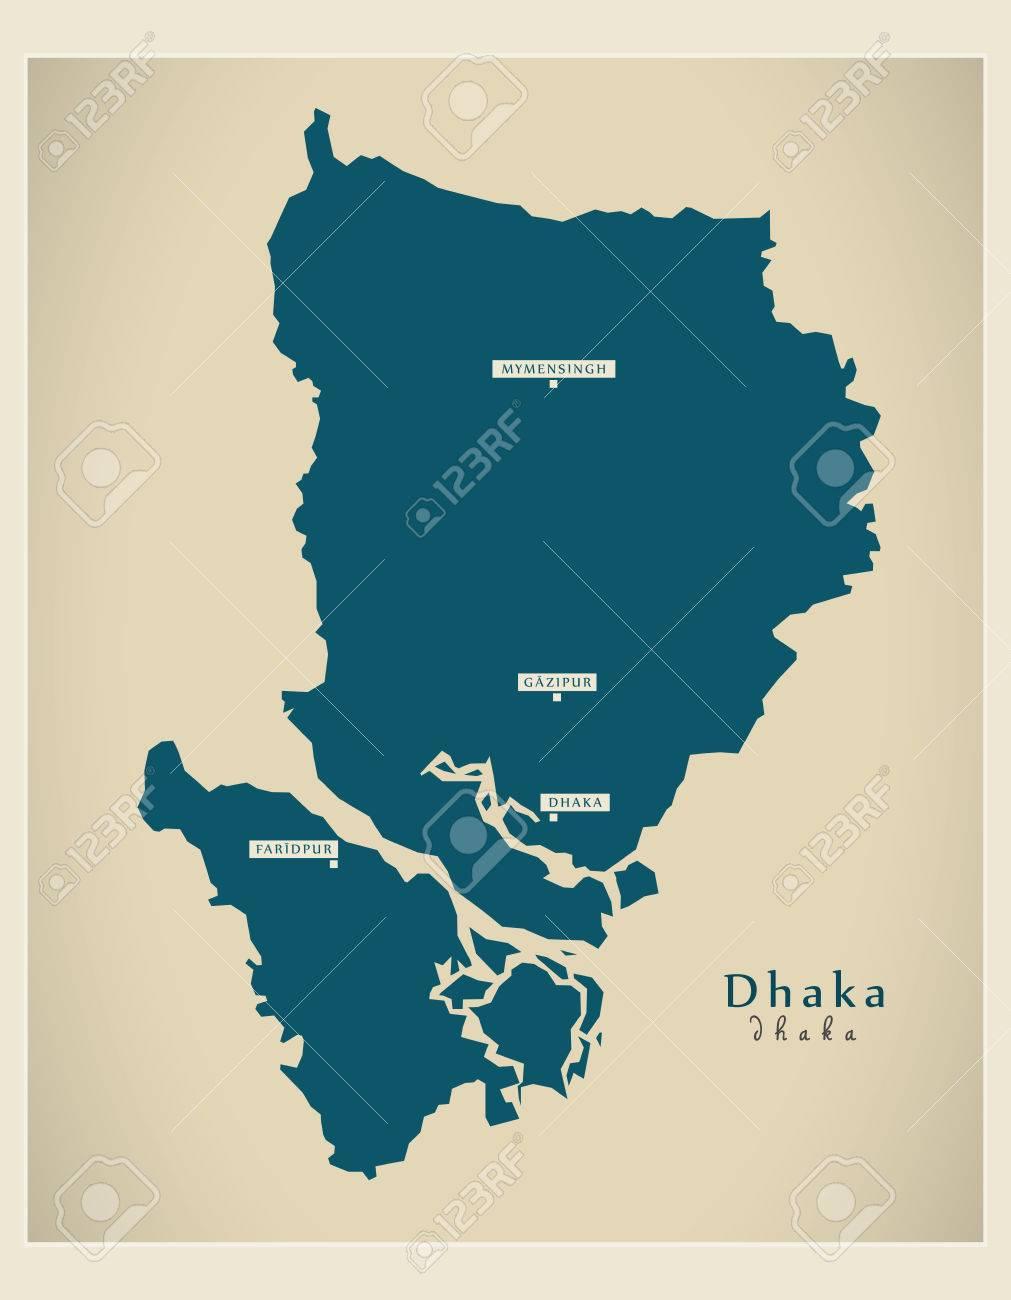 Modern Map - Dhaka BD on kolkata map, ahmedabad map, bangladesh map, karachi map, tel aviv map, kathmandu map, atlanta map, chittagong map, thimphu map, ashgabat map, lahore map, kabul map, chennai map, hyderabad map, kuala lumpur map, bangkok map, islamabad map, ganges river map, calcutta map, bengaluru map,